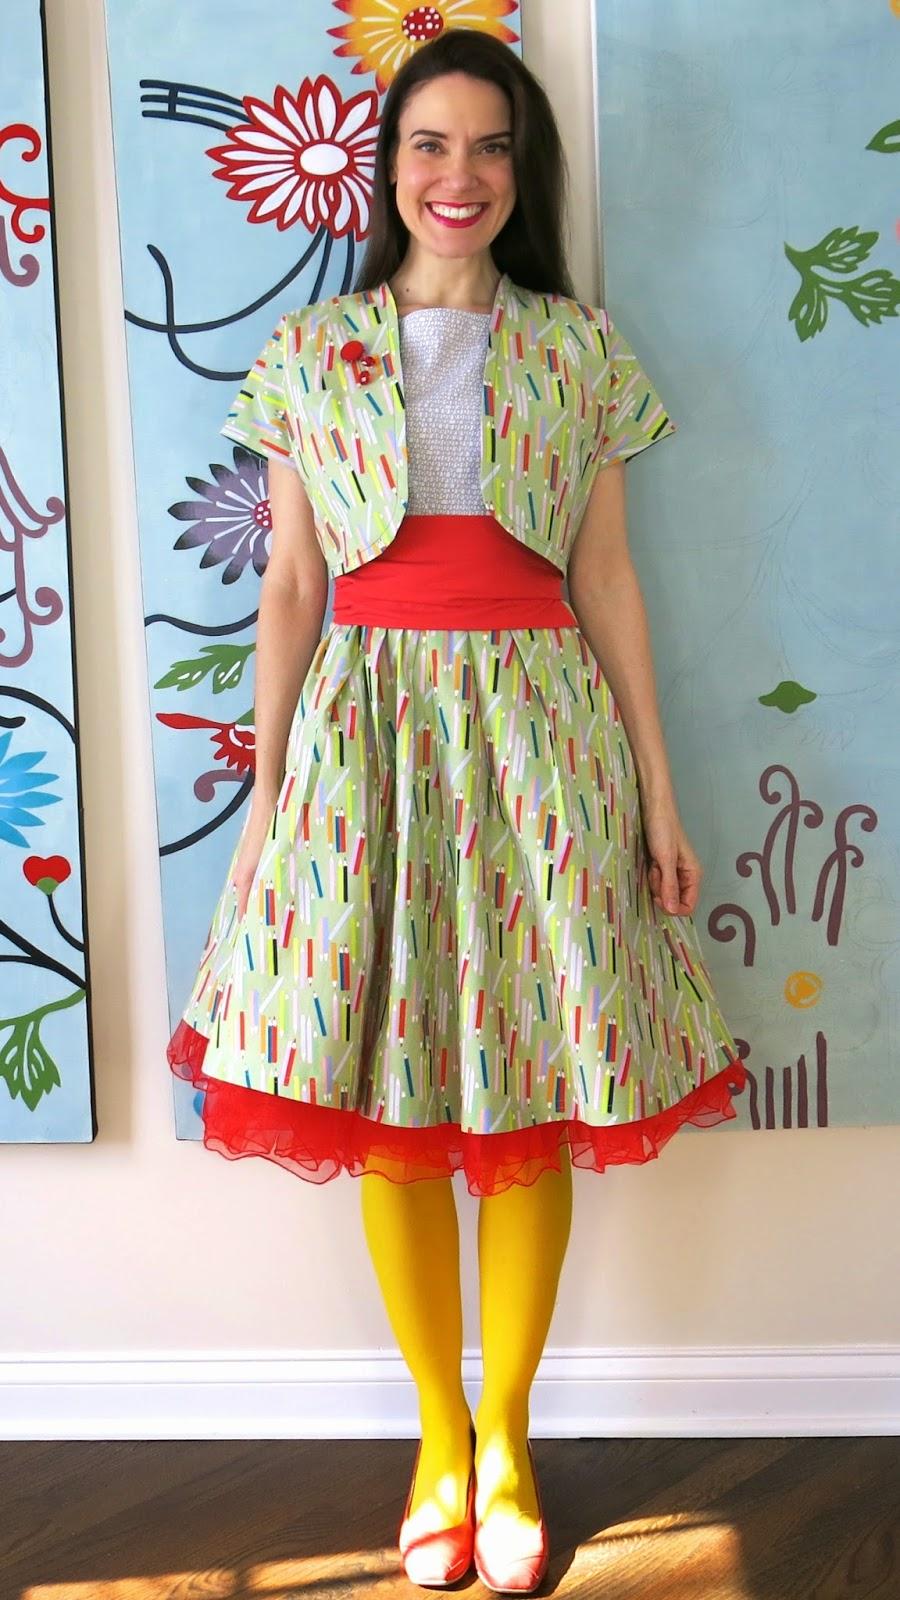 Cassie stephens how to dress like an art teacher diy a colored pencil dress and bolero many dif ways solutioingenieria Images